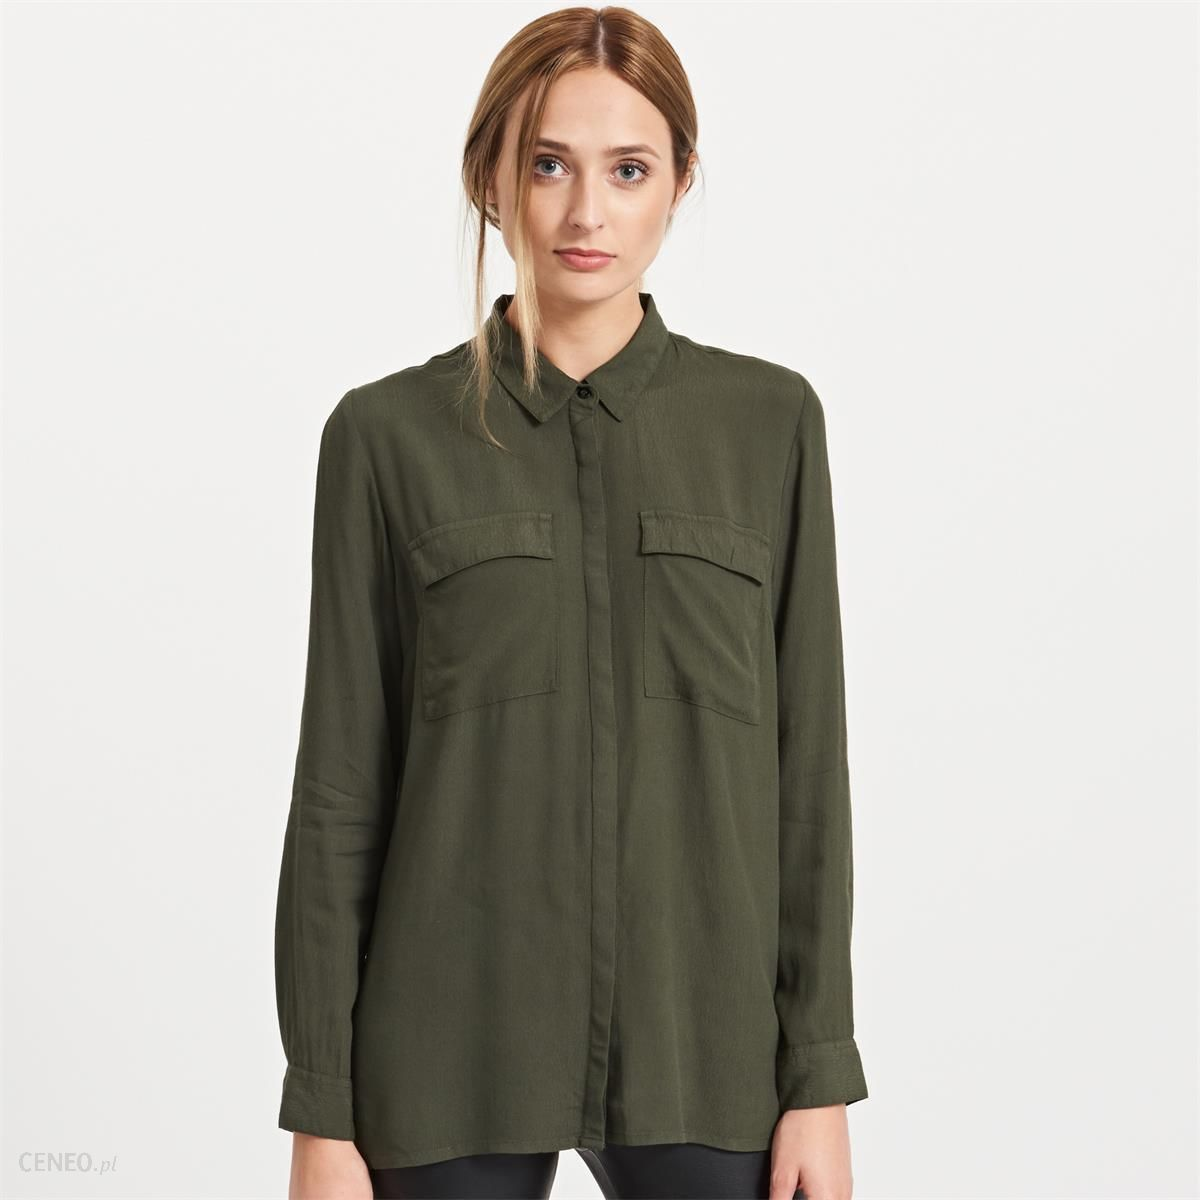 Reserved Koszula khaki Zielony damska Ceny i opinie